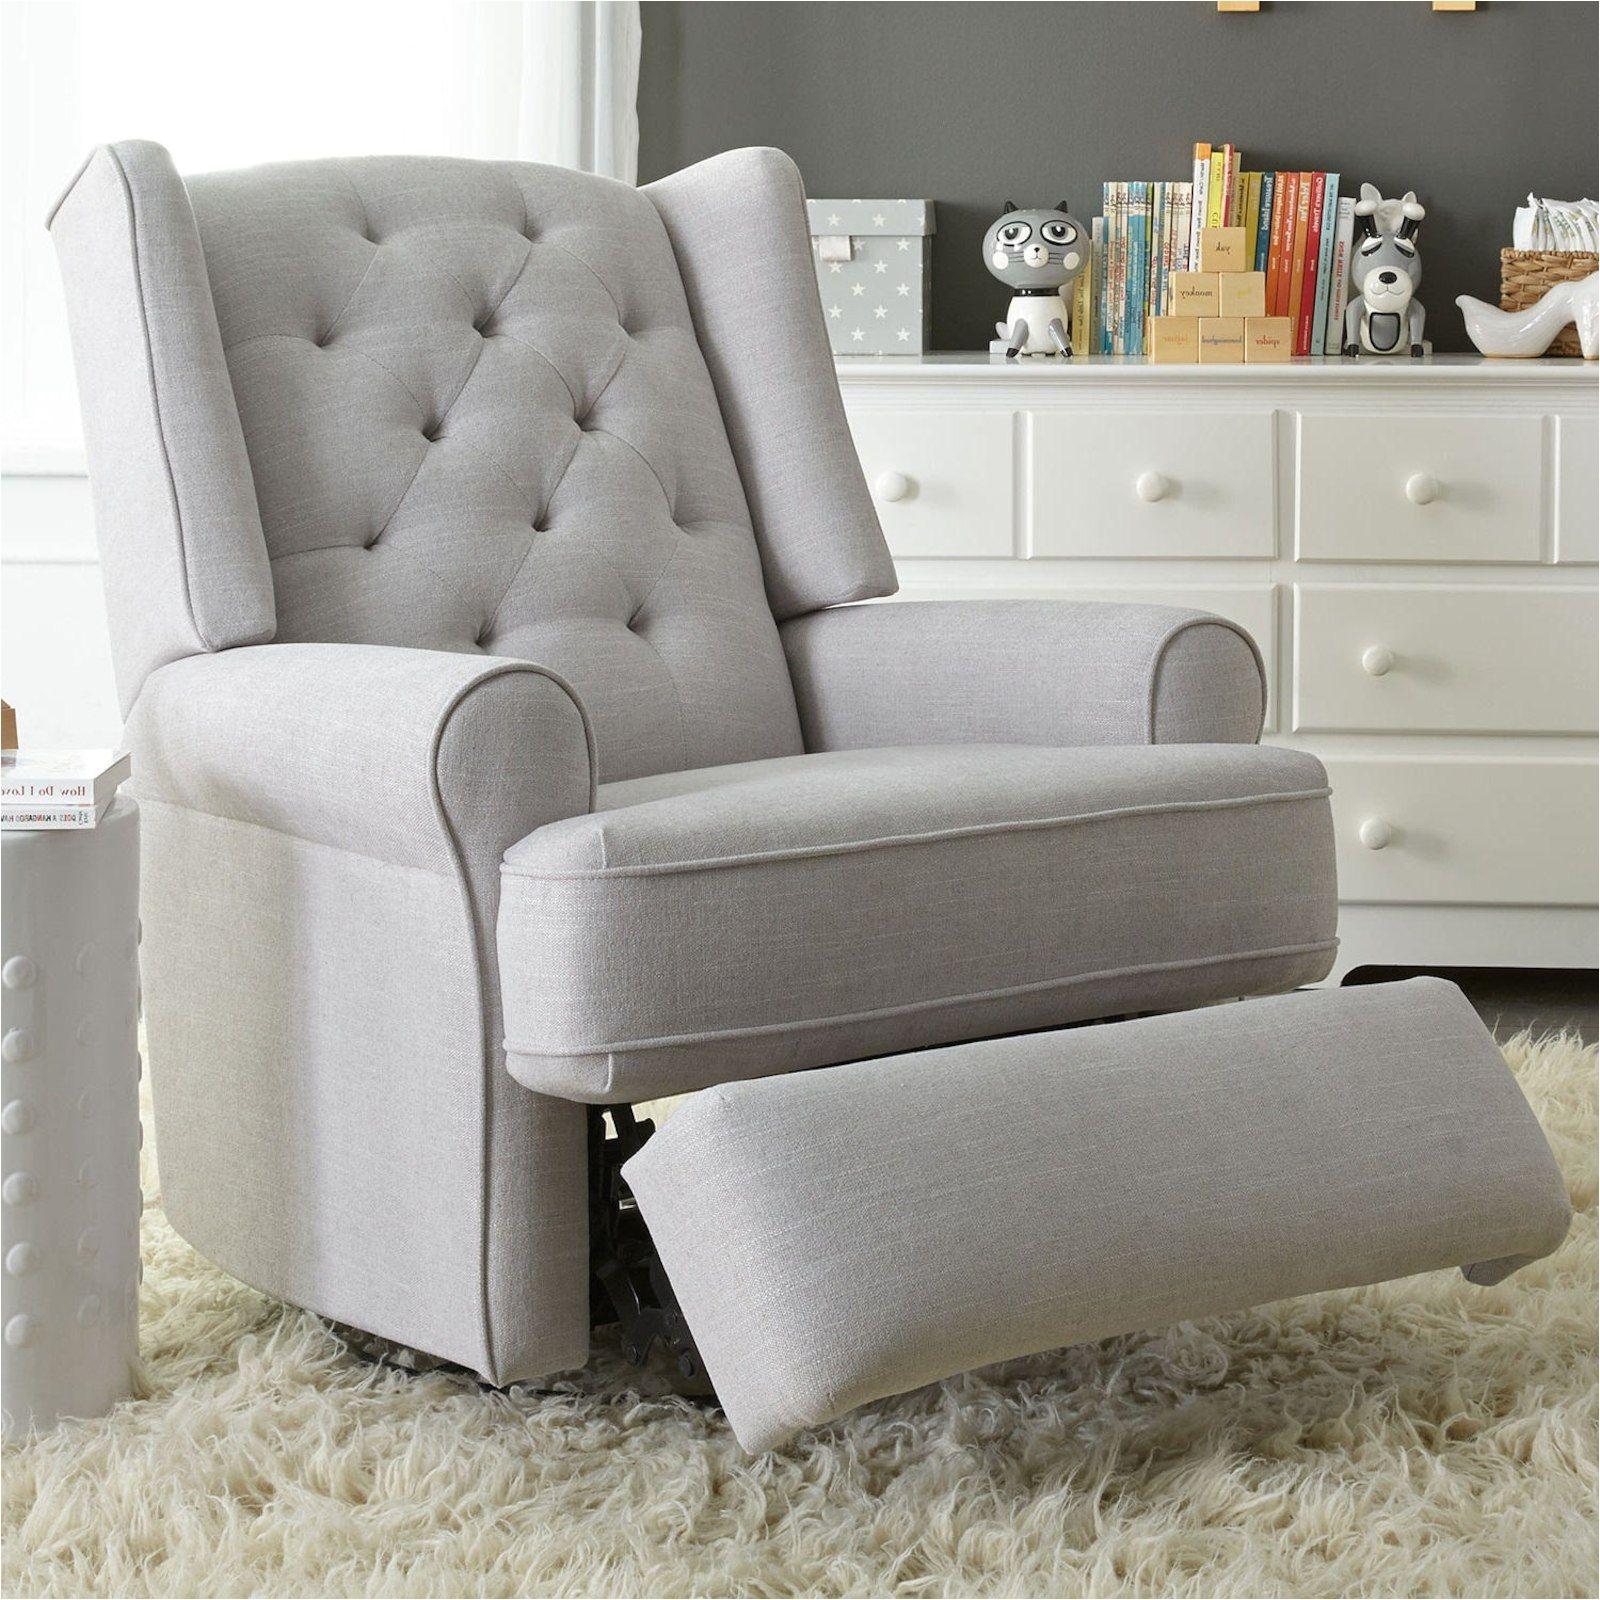 Nursing Rocking Chair Toys R Us Best Chairs Finley Swivel Glider Recliner  Gray Tweed Nursery